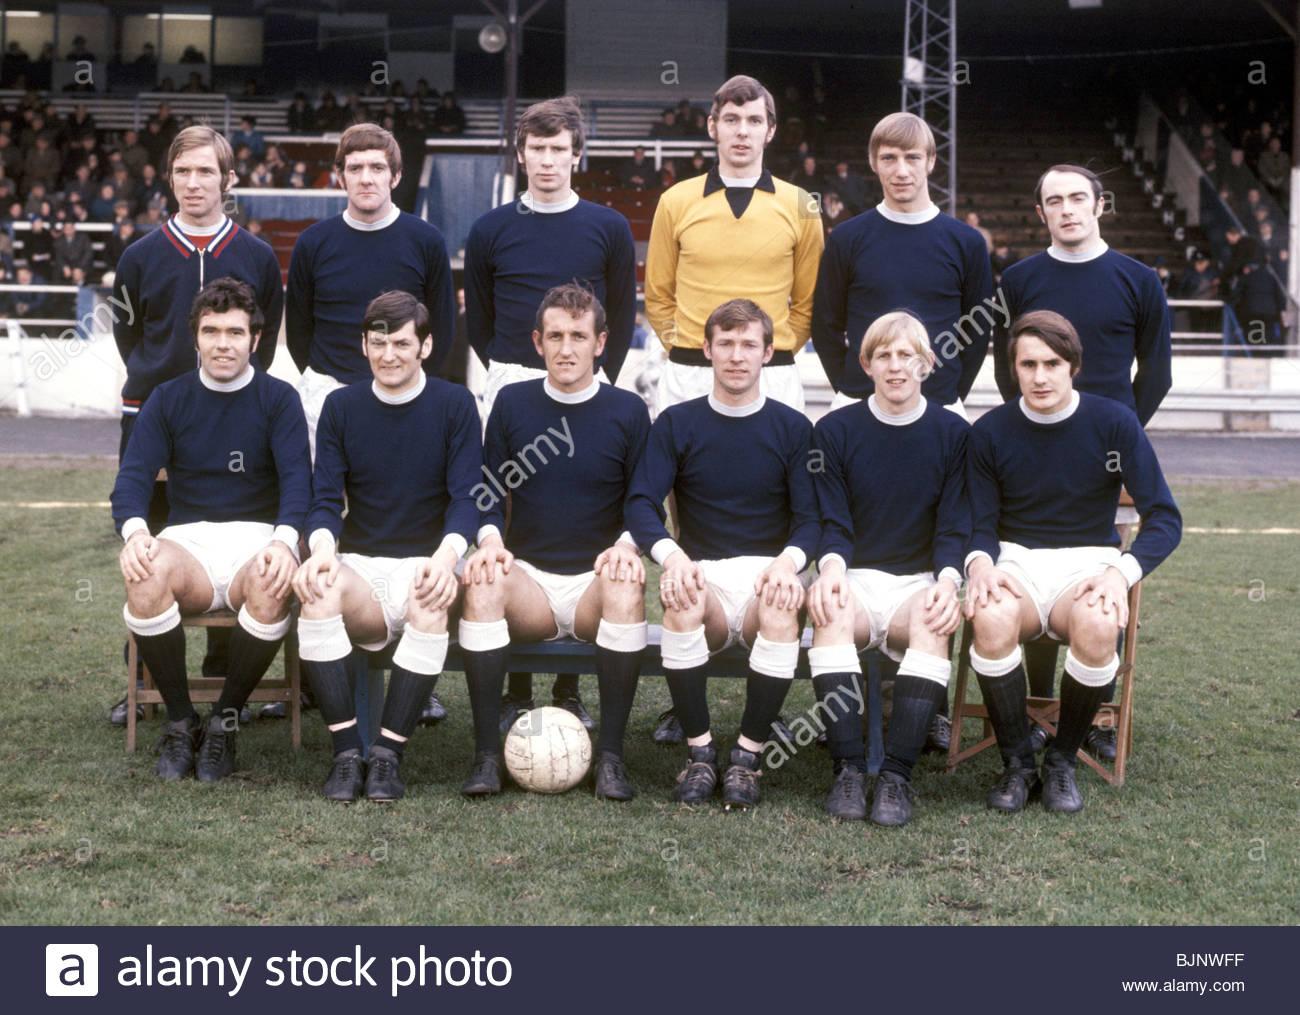 1970/1971 FALKIRK TEAM Back row (L to R) Dennis Setterington, John Markie, Gregor Abel, Stuart Rennie, George Gibson, - Stock Image